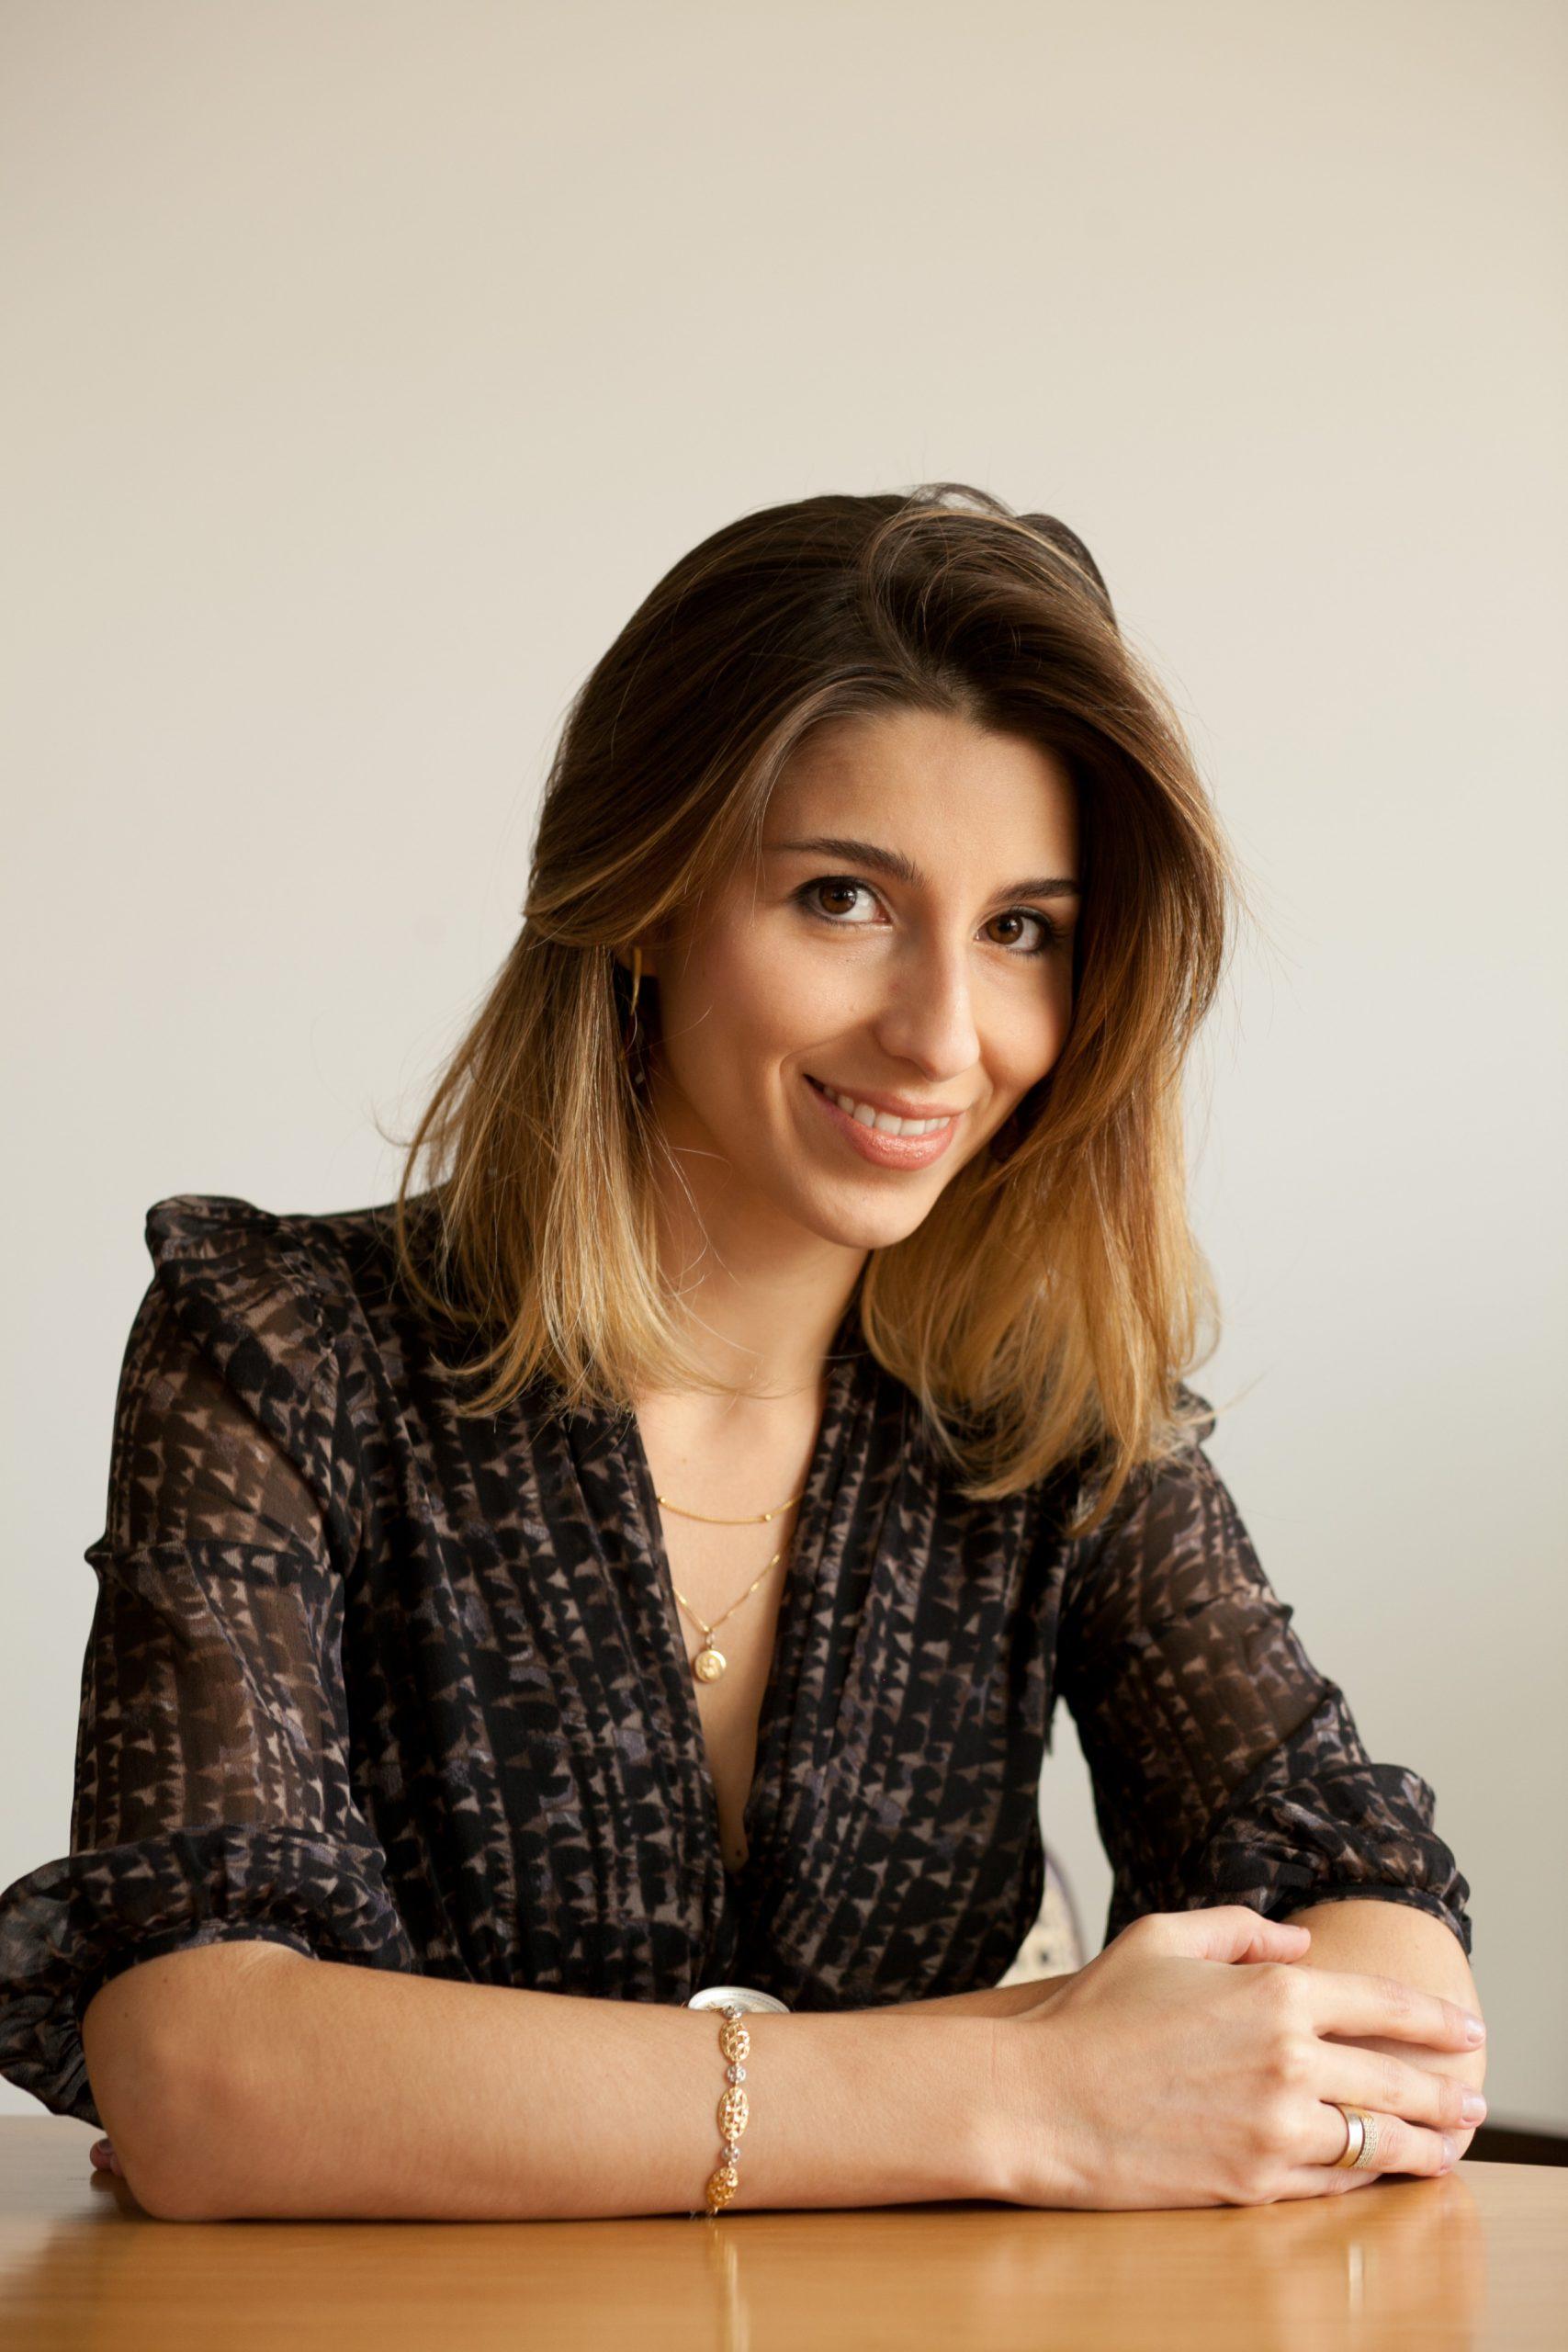 Angela Donaggio